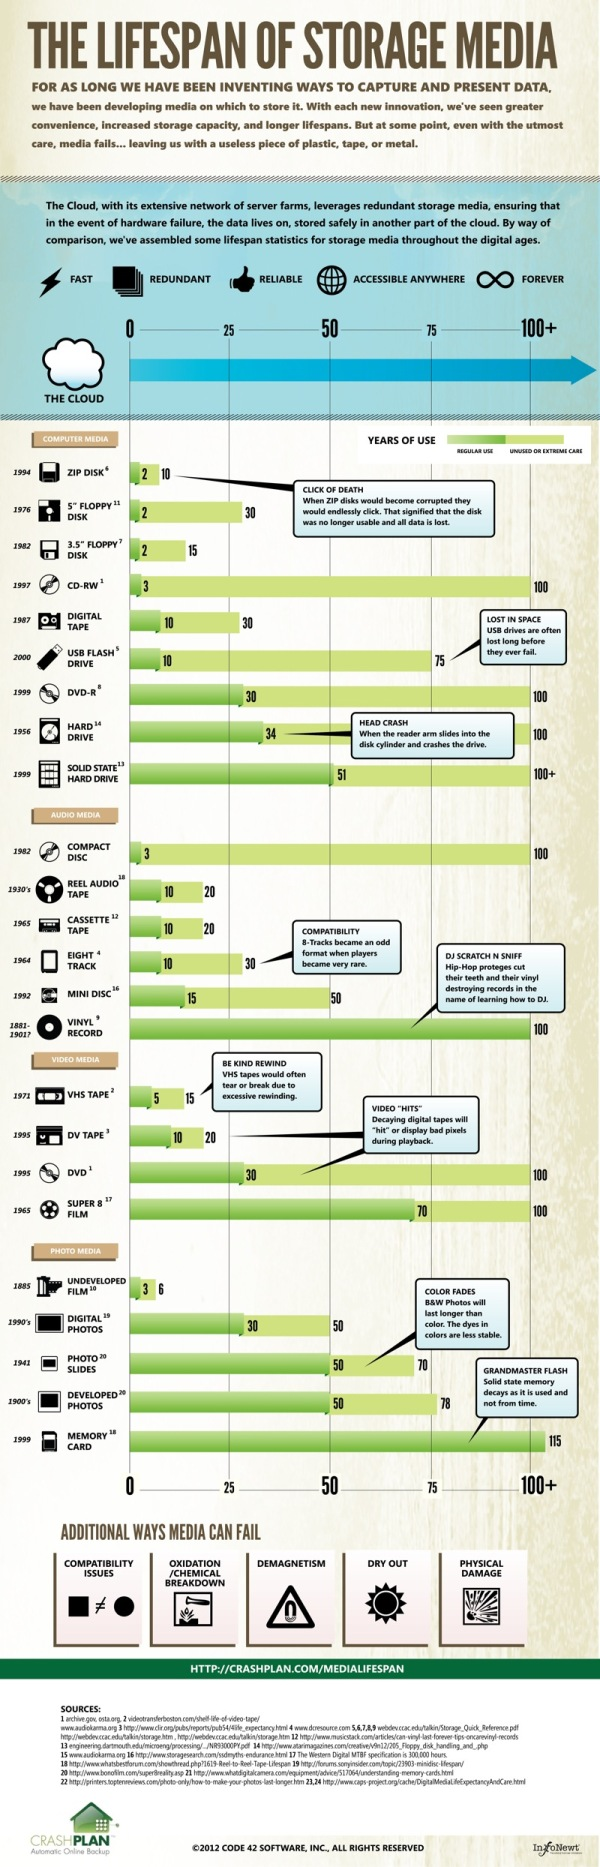 storage-media-lifespan